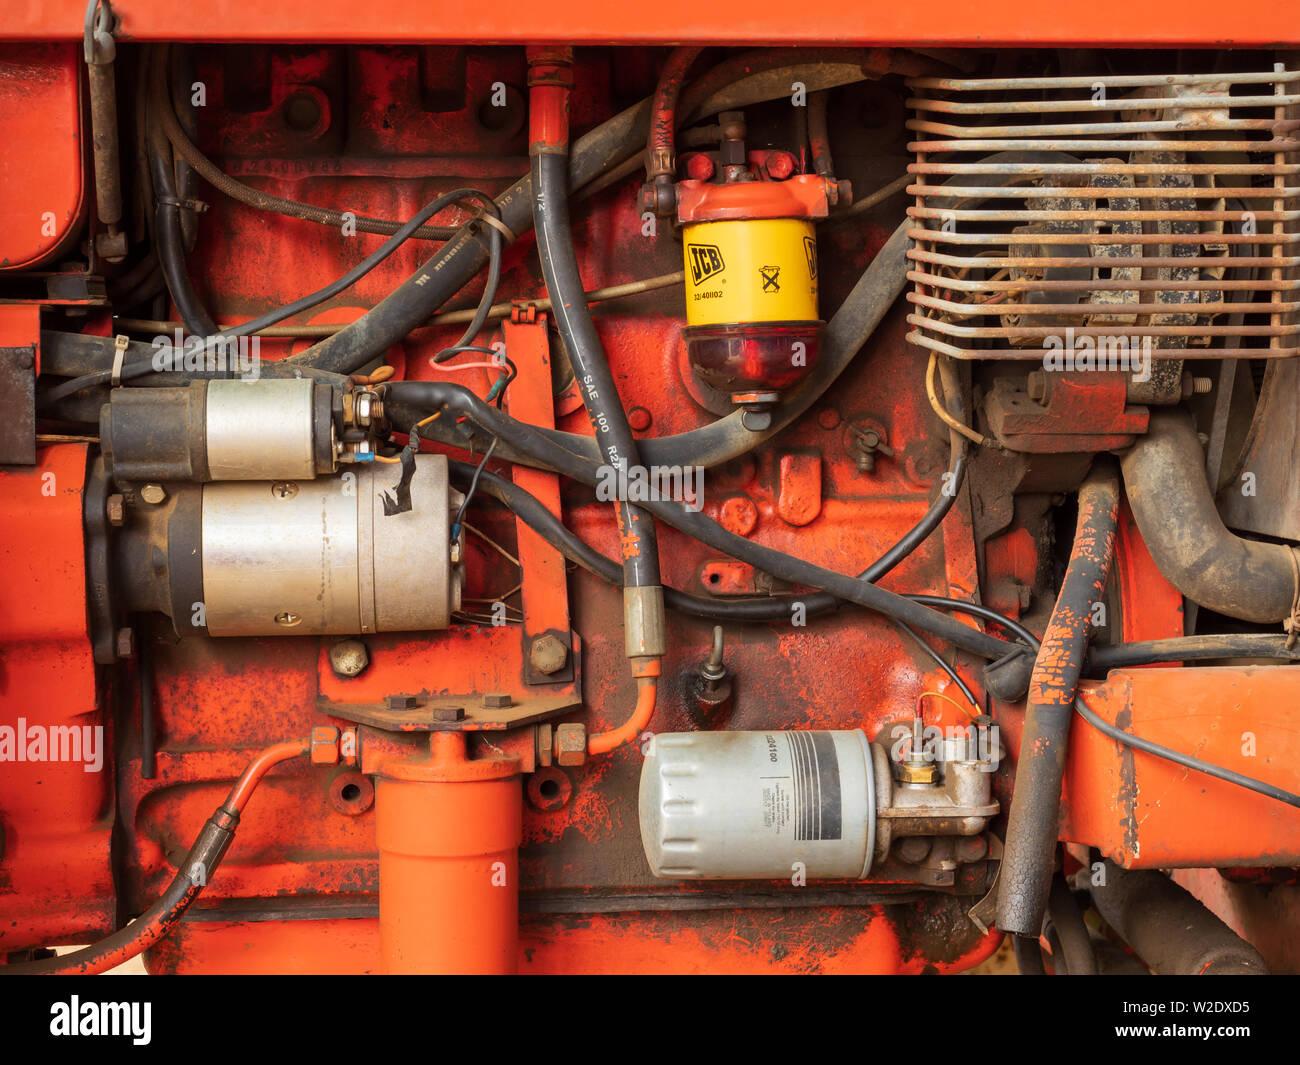 Engine Coolant Stock Photos & Engine Coolant Stock Images